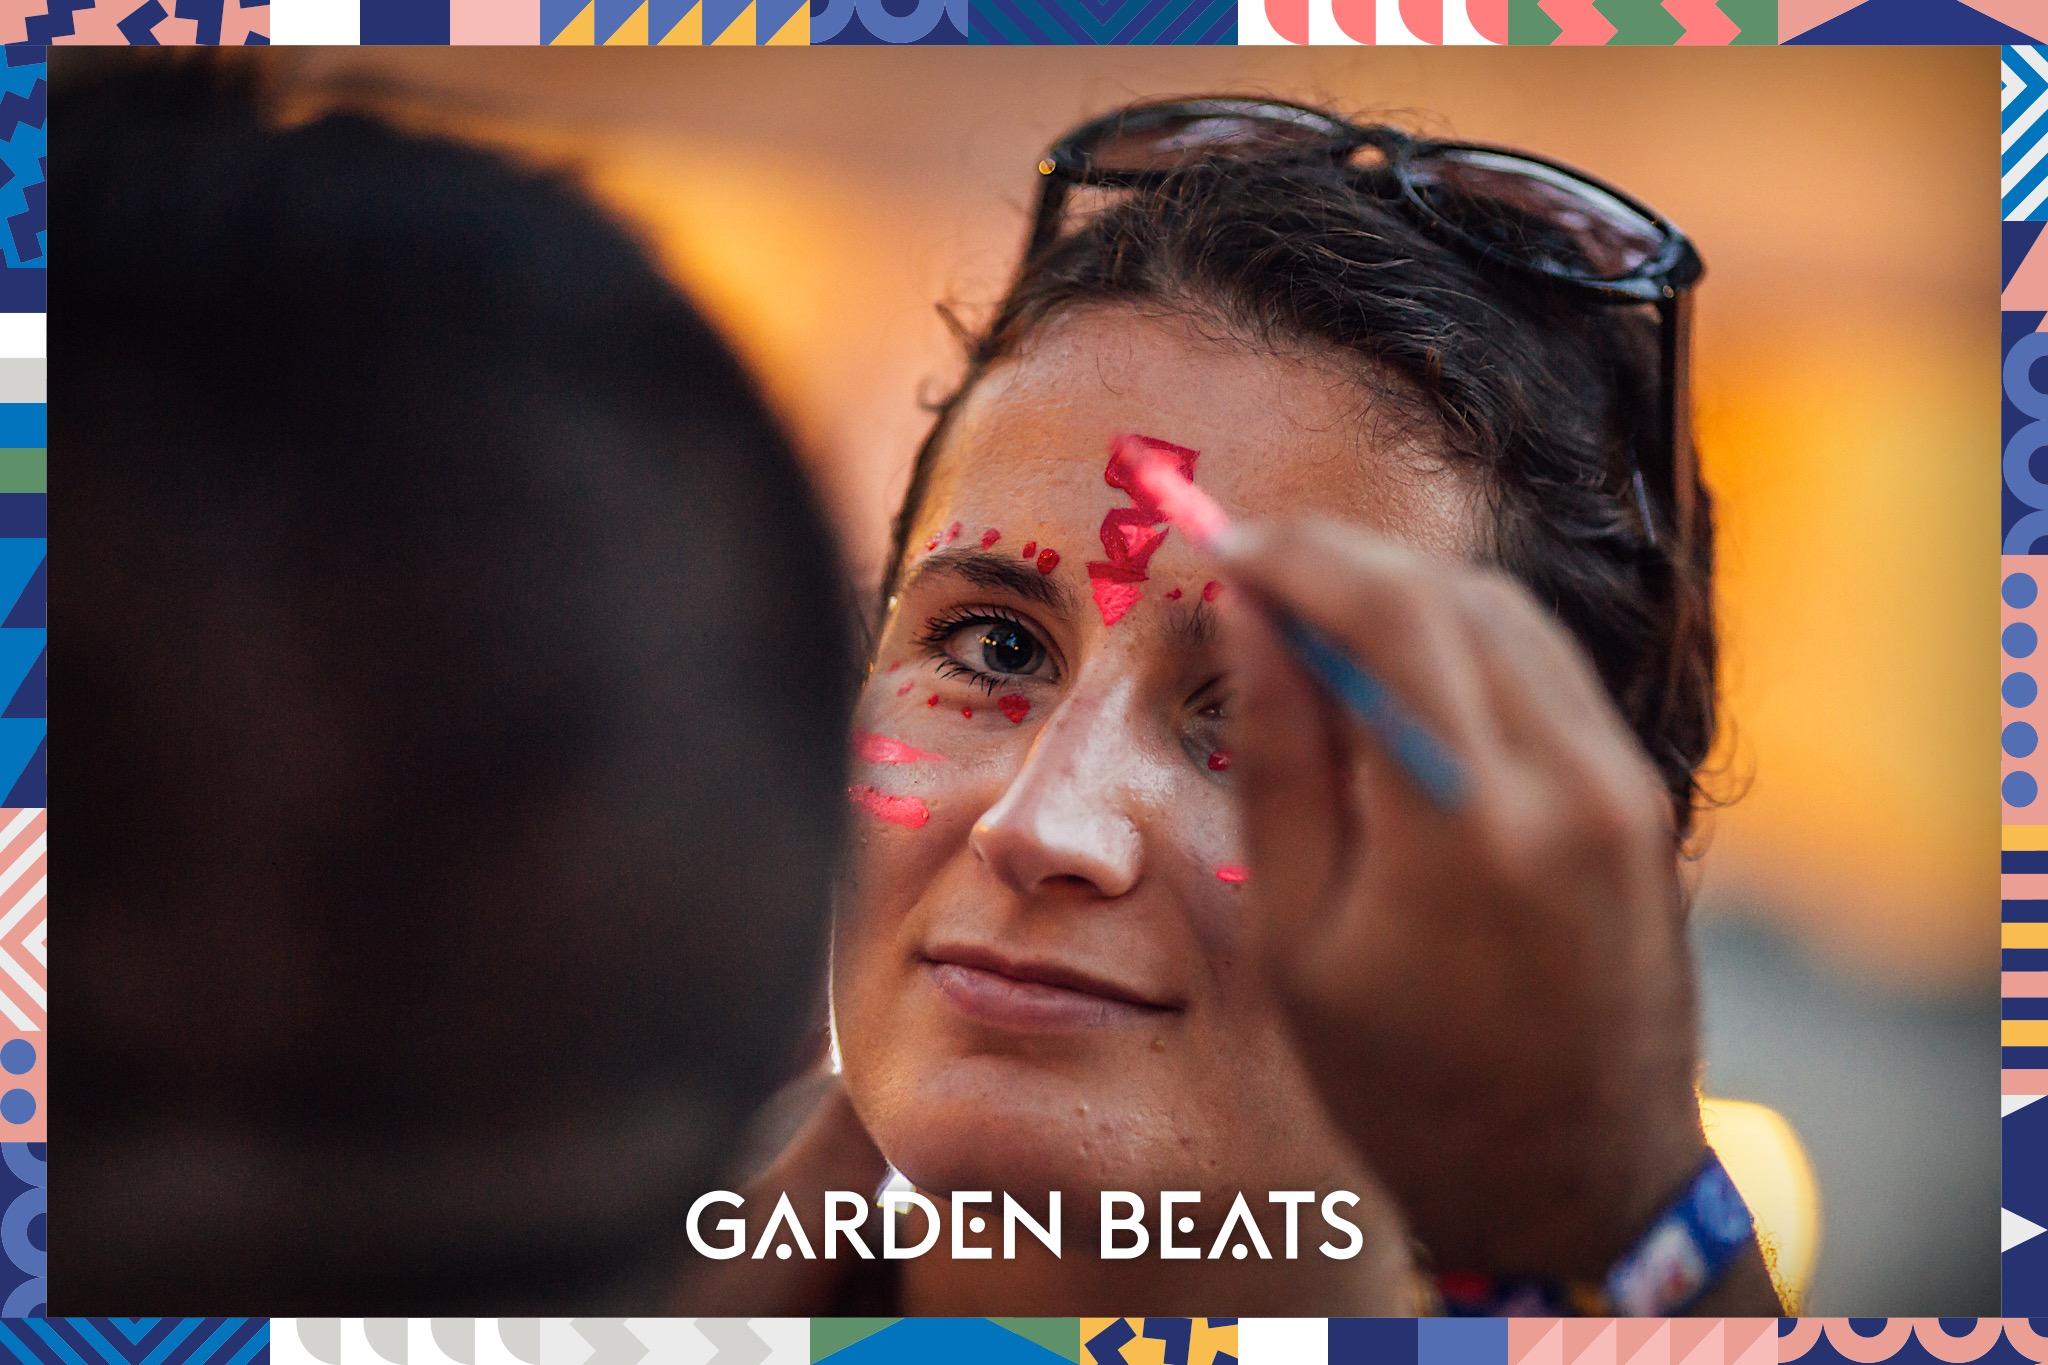 18032017_GardenBeats_Colossal708_WatermarkedGB.jpg